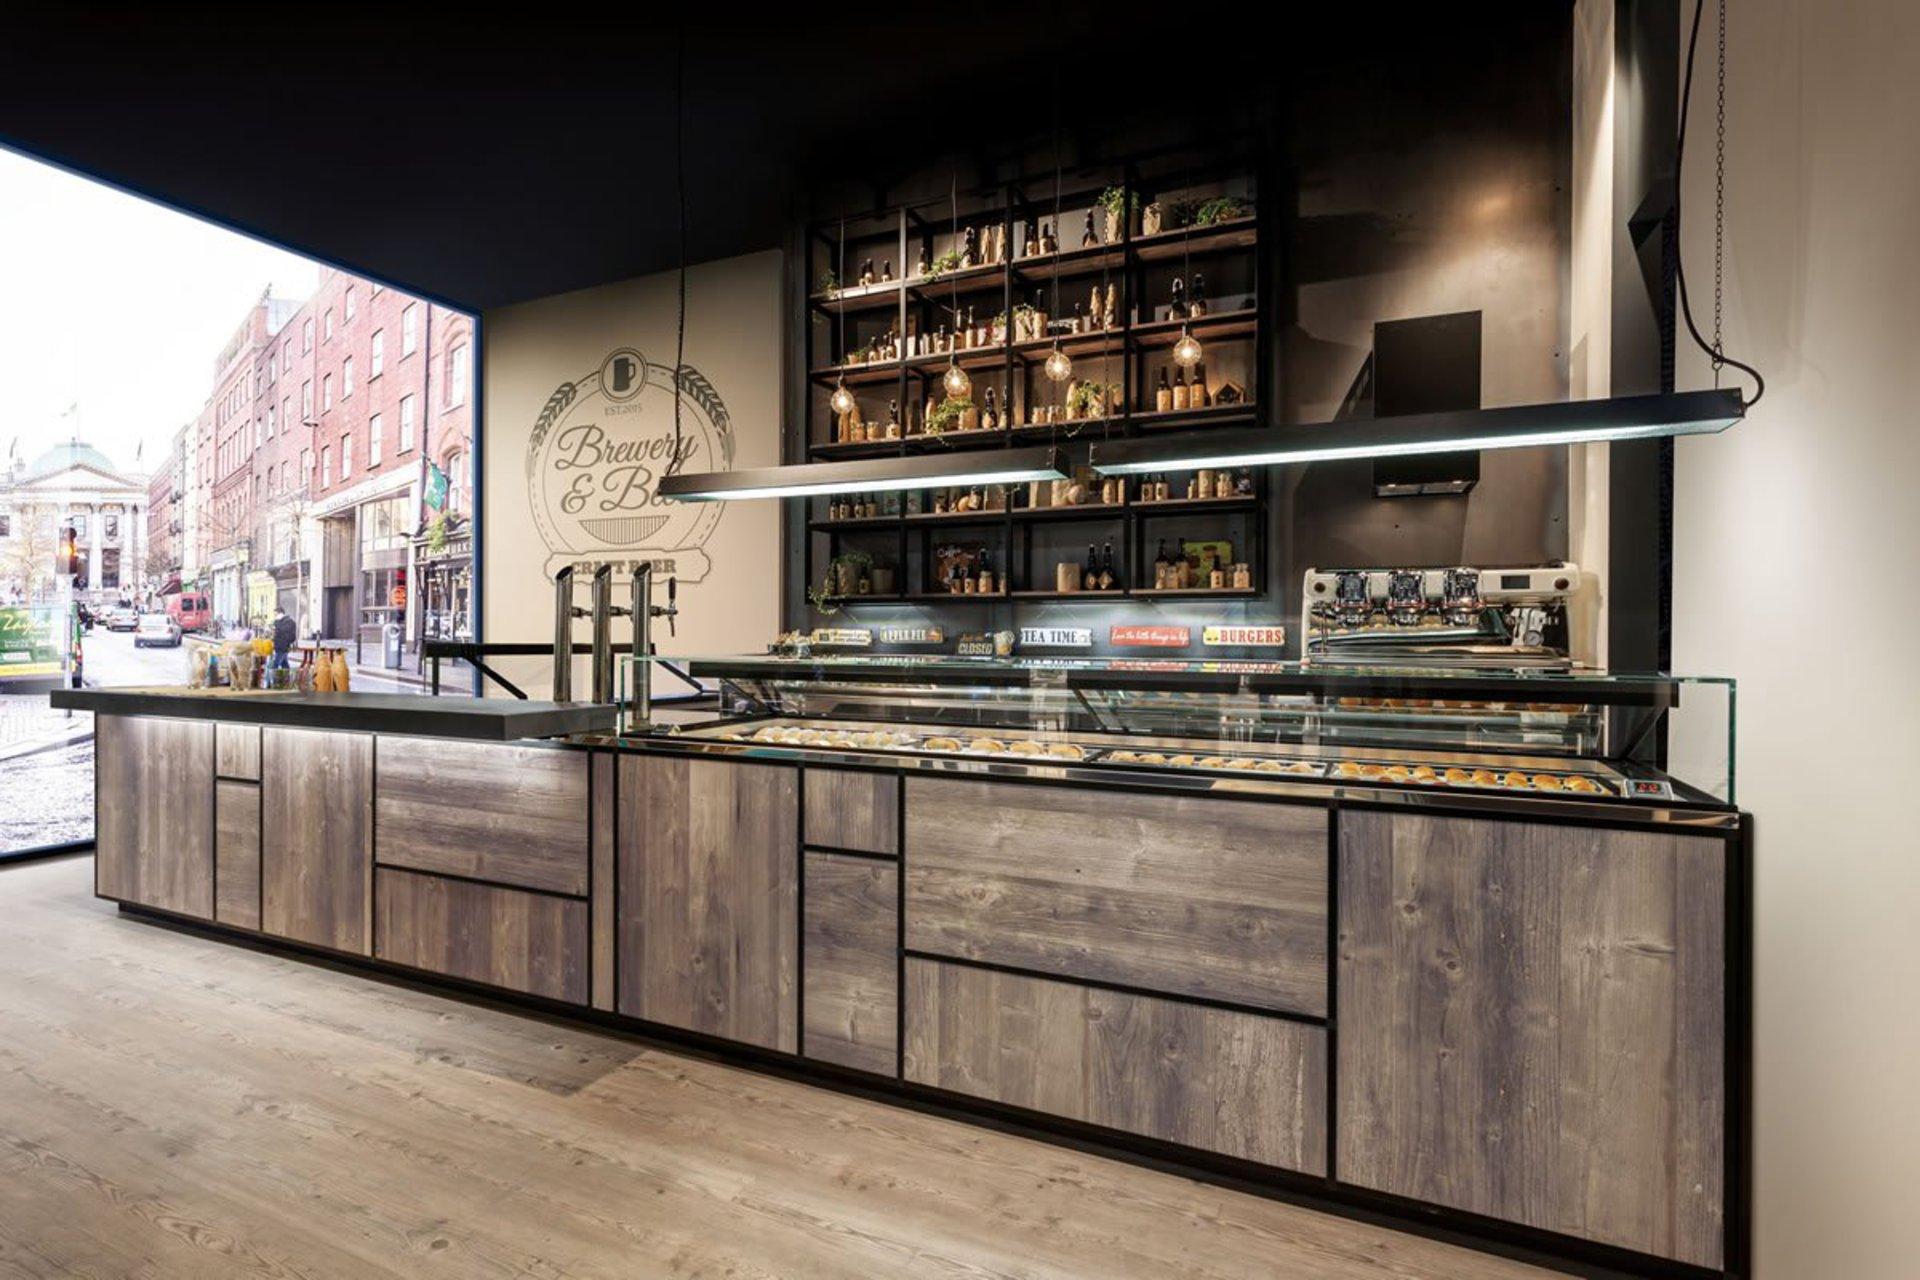 Deli & Coffee Shop Countering Systems